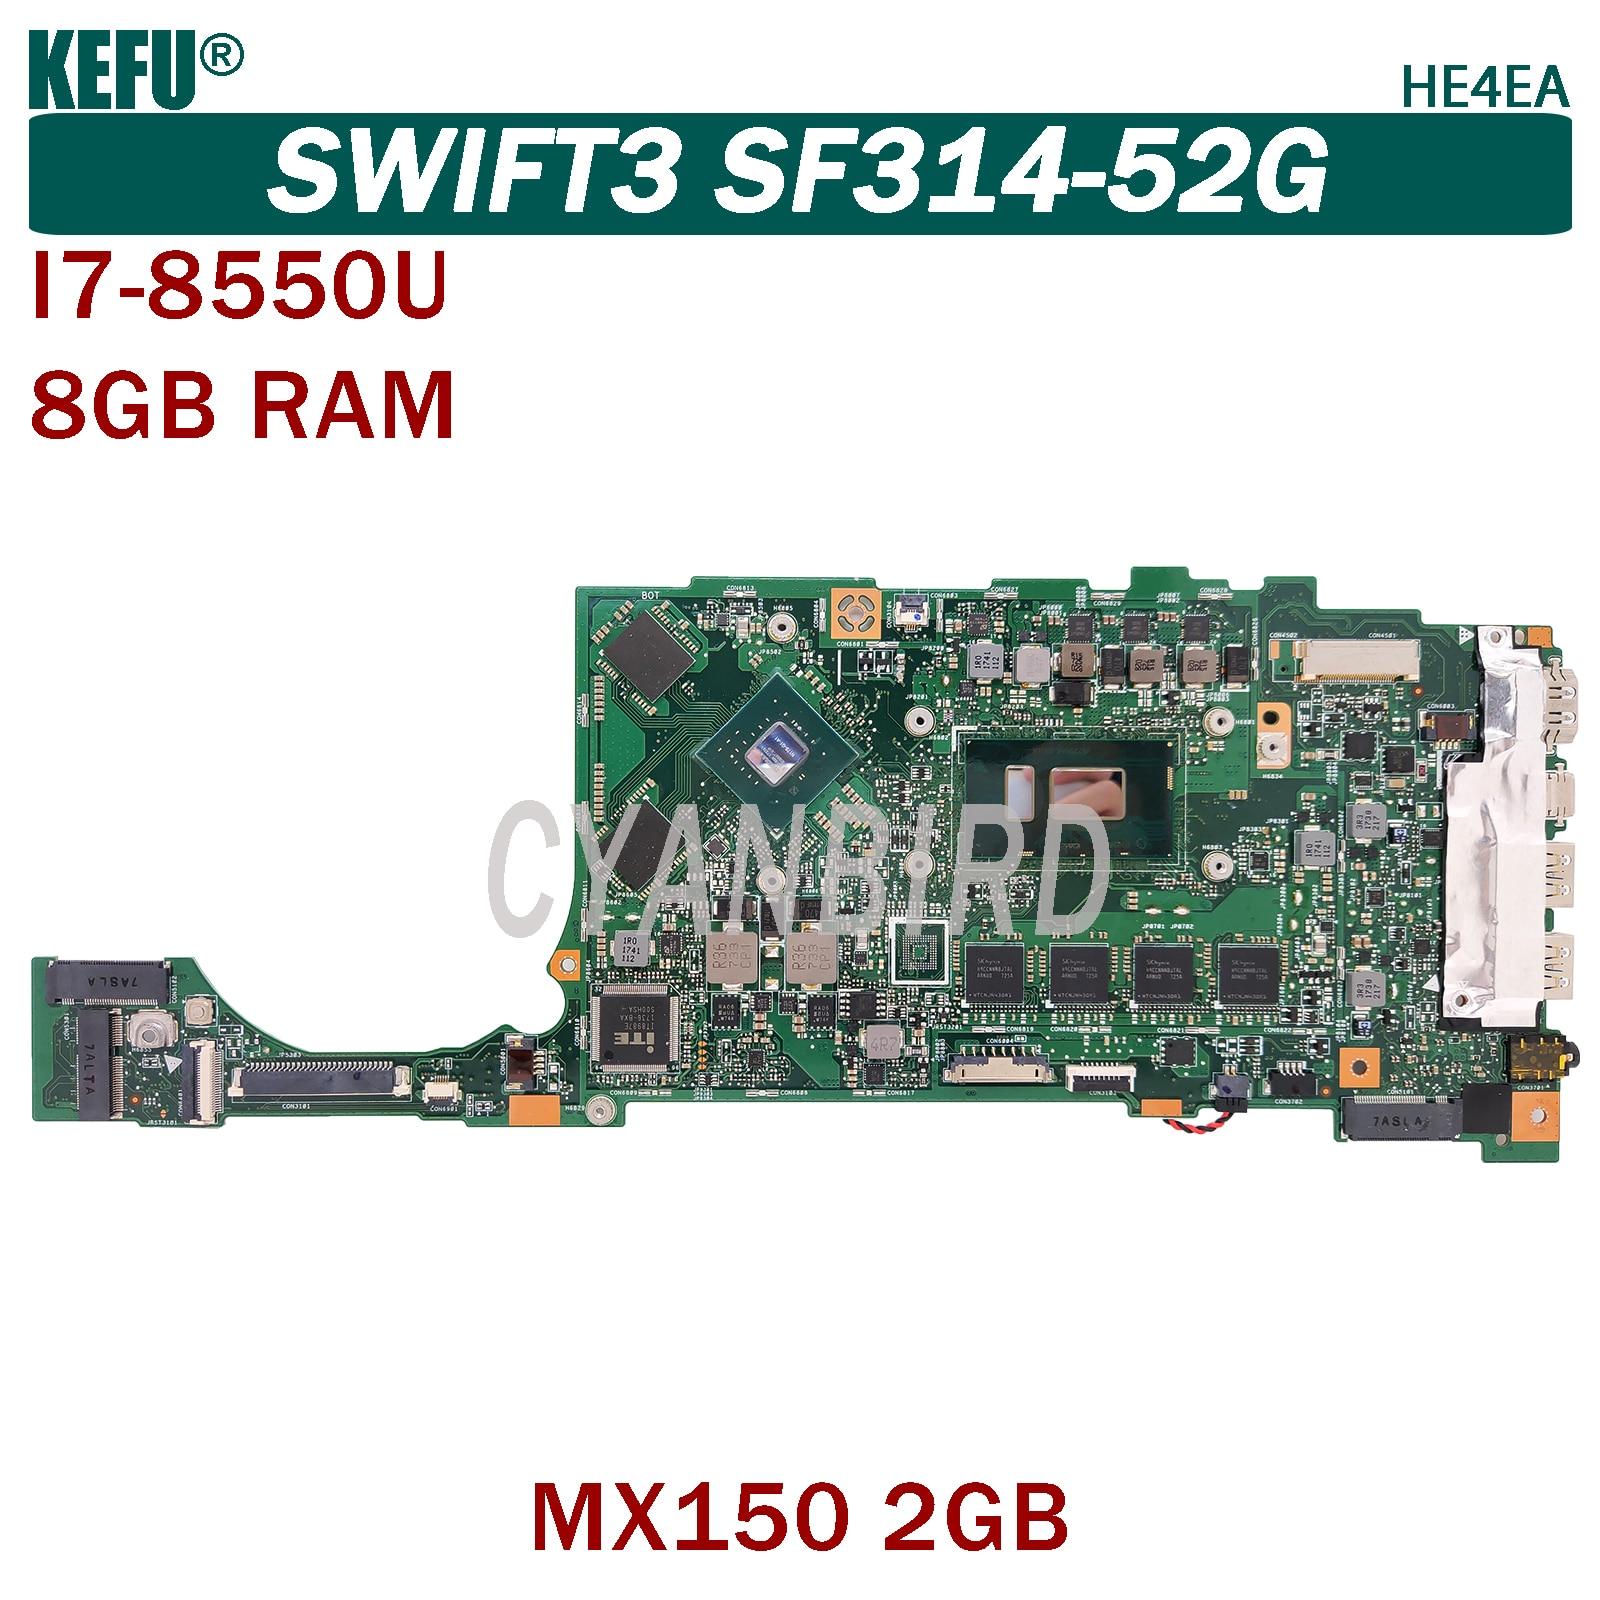 KEFU HE4EA الأصلي اللوحة الرئيسية لشركة أيسر Swift3 SF314-52G SF314-52 مع 8GB-RAM I7-8550U اللوحة الأم للكمبيوتر المحمول MX150-2GB